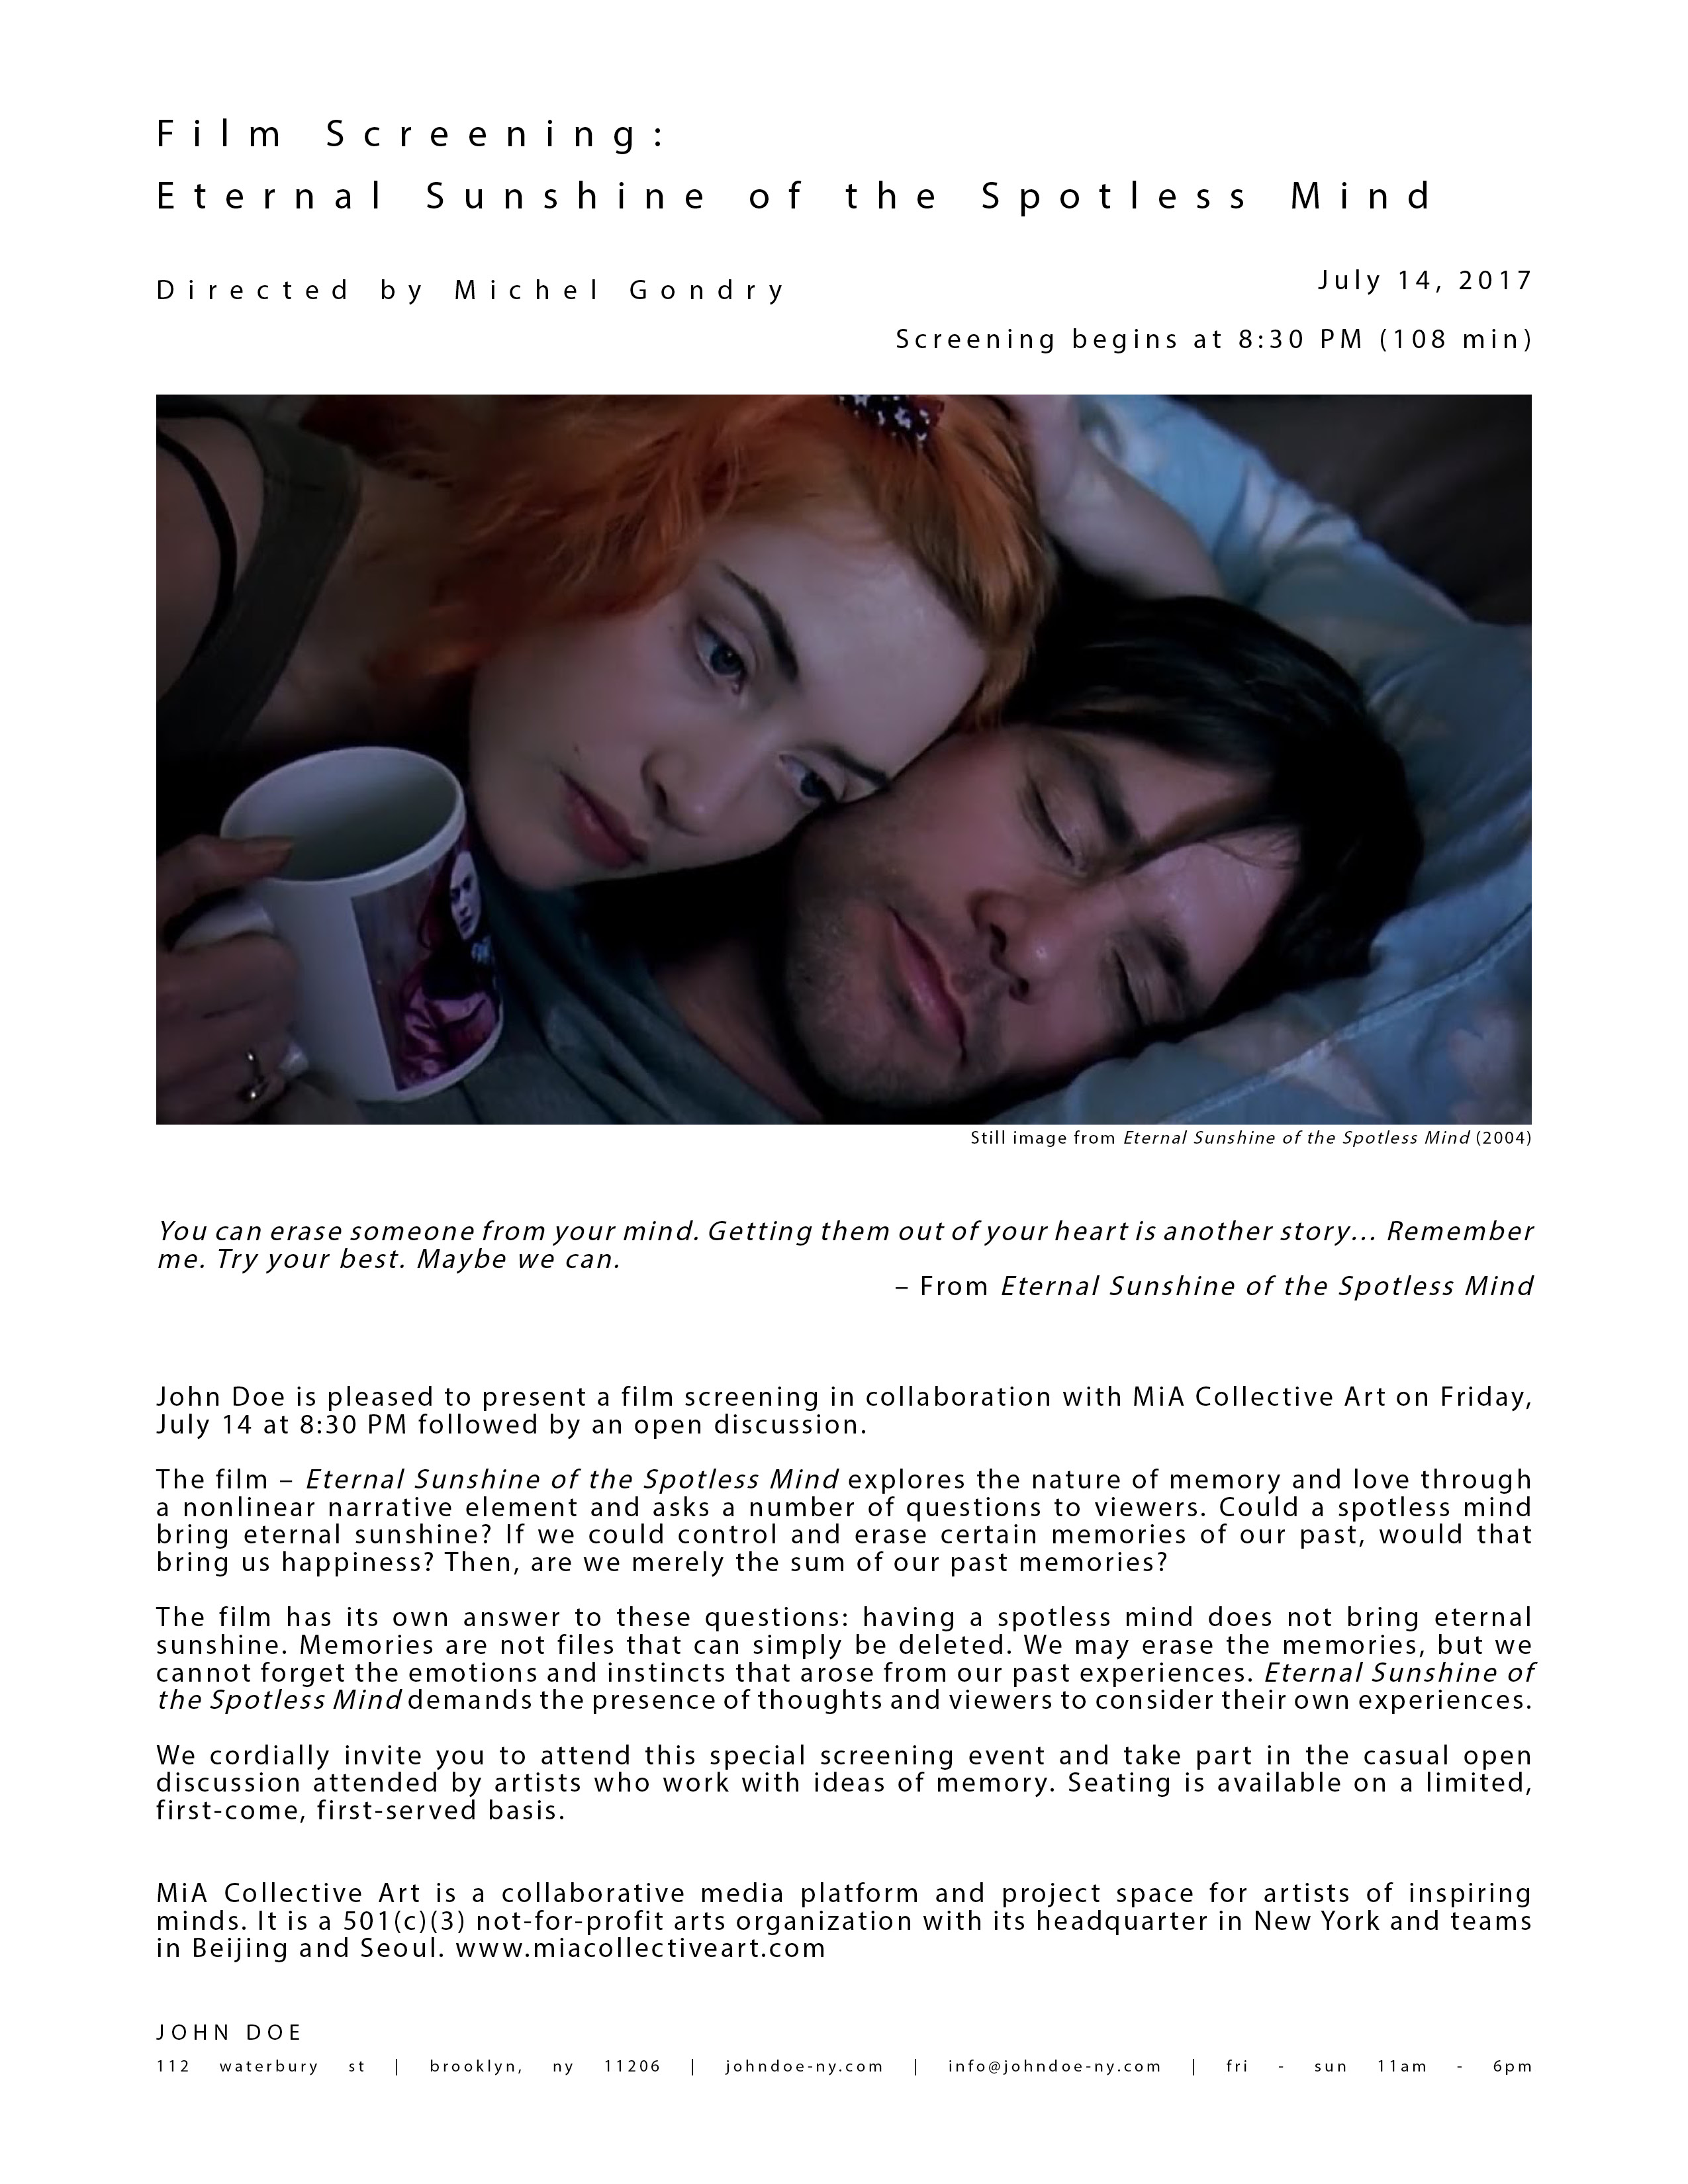 film evaluation eternal sunshine of